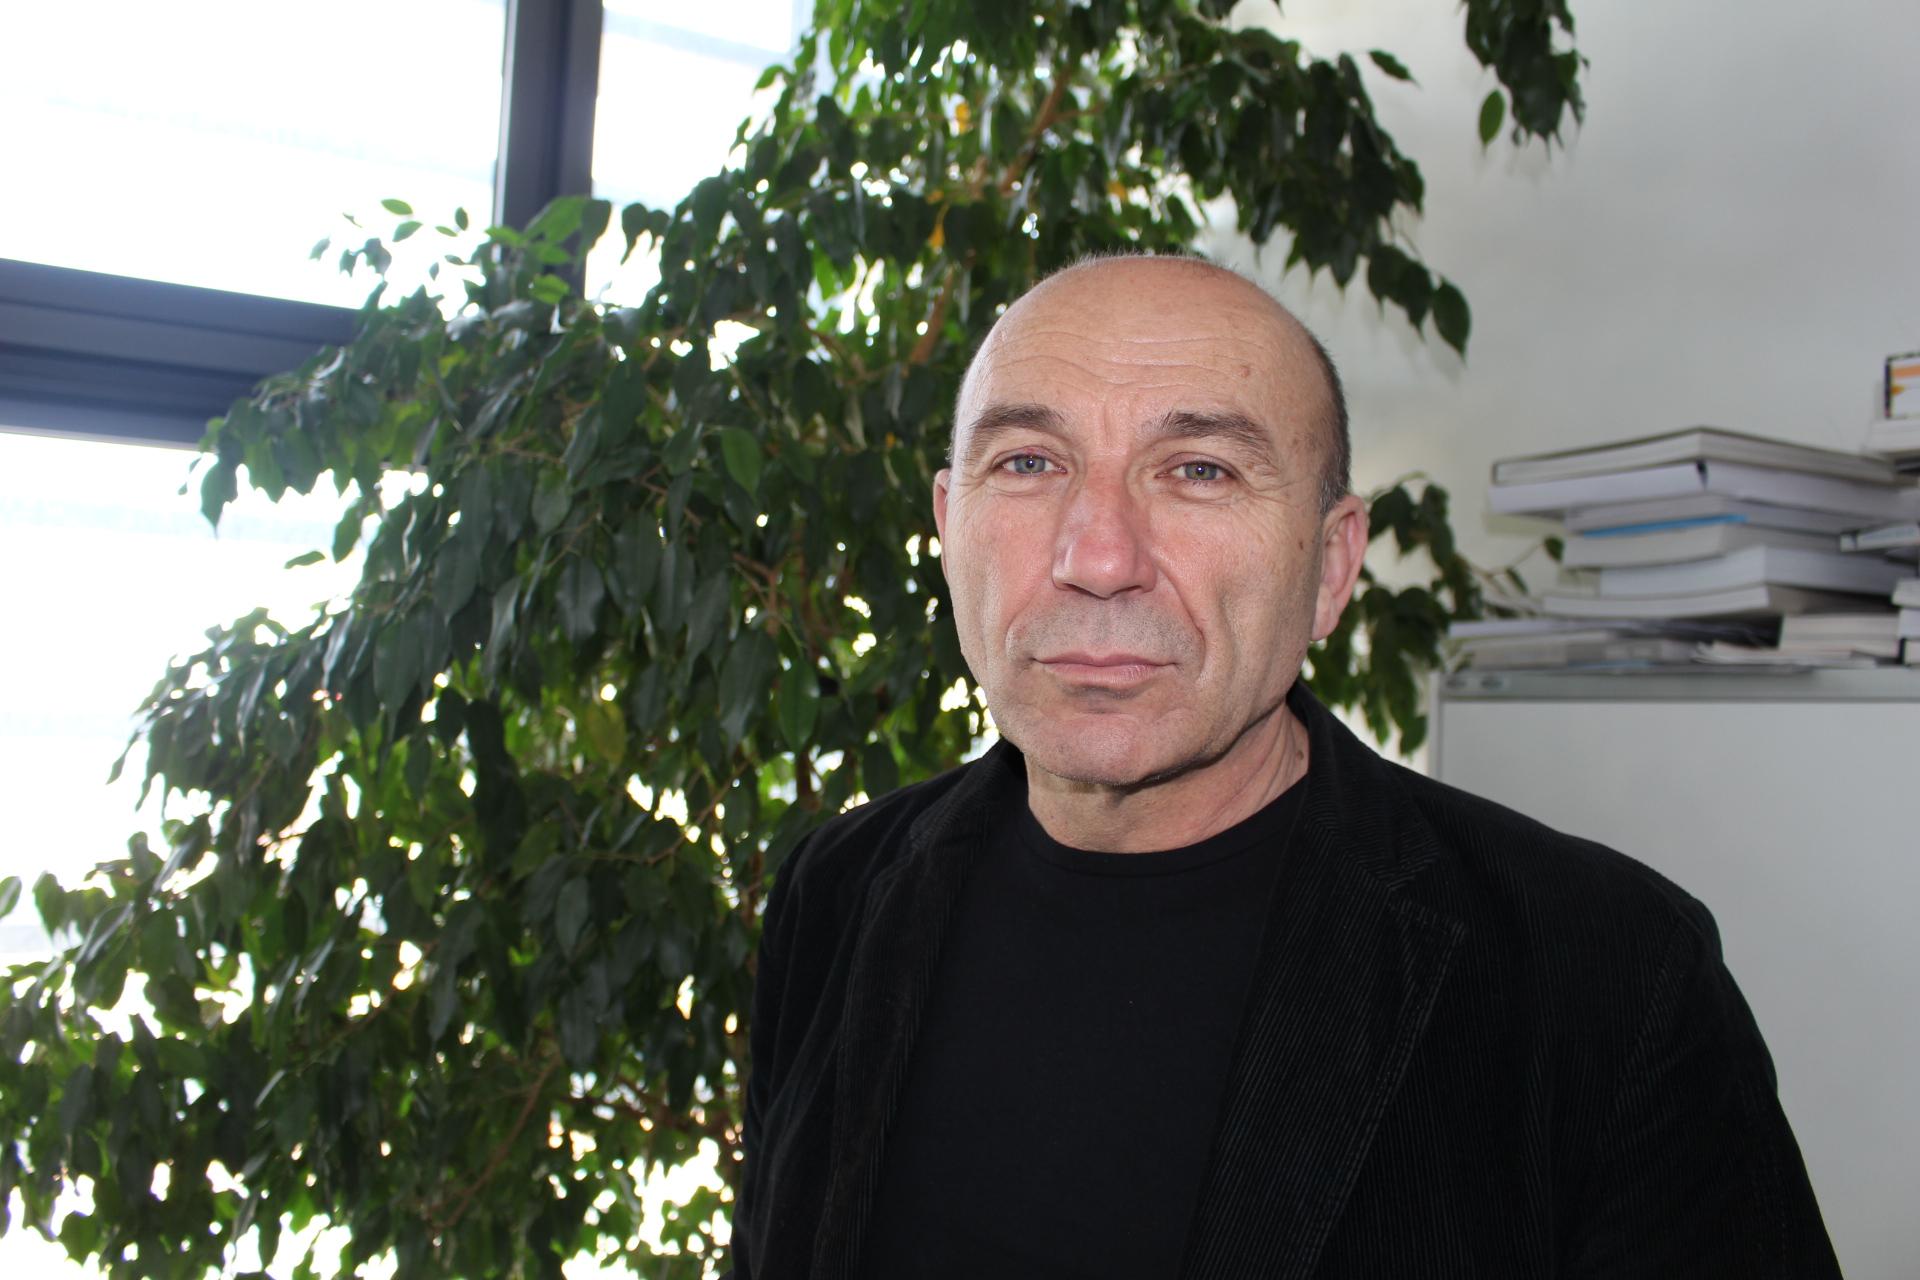 Tihomir Milovac